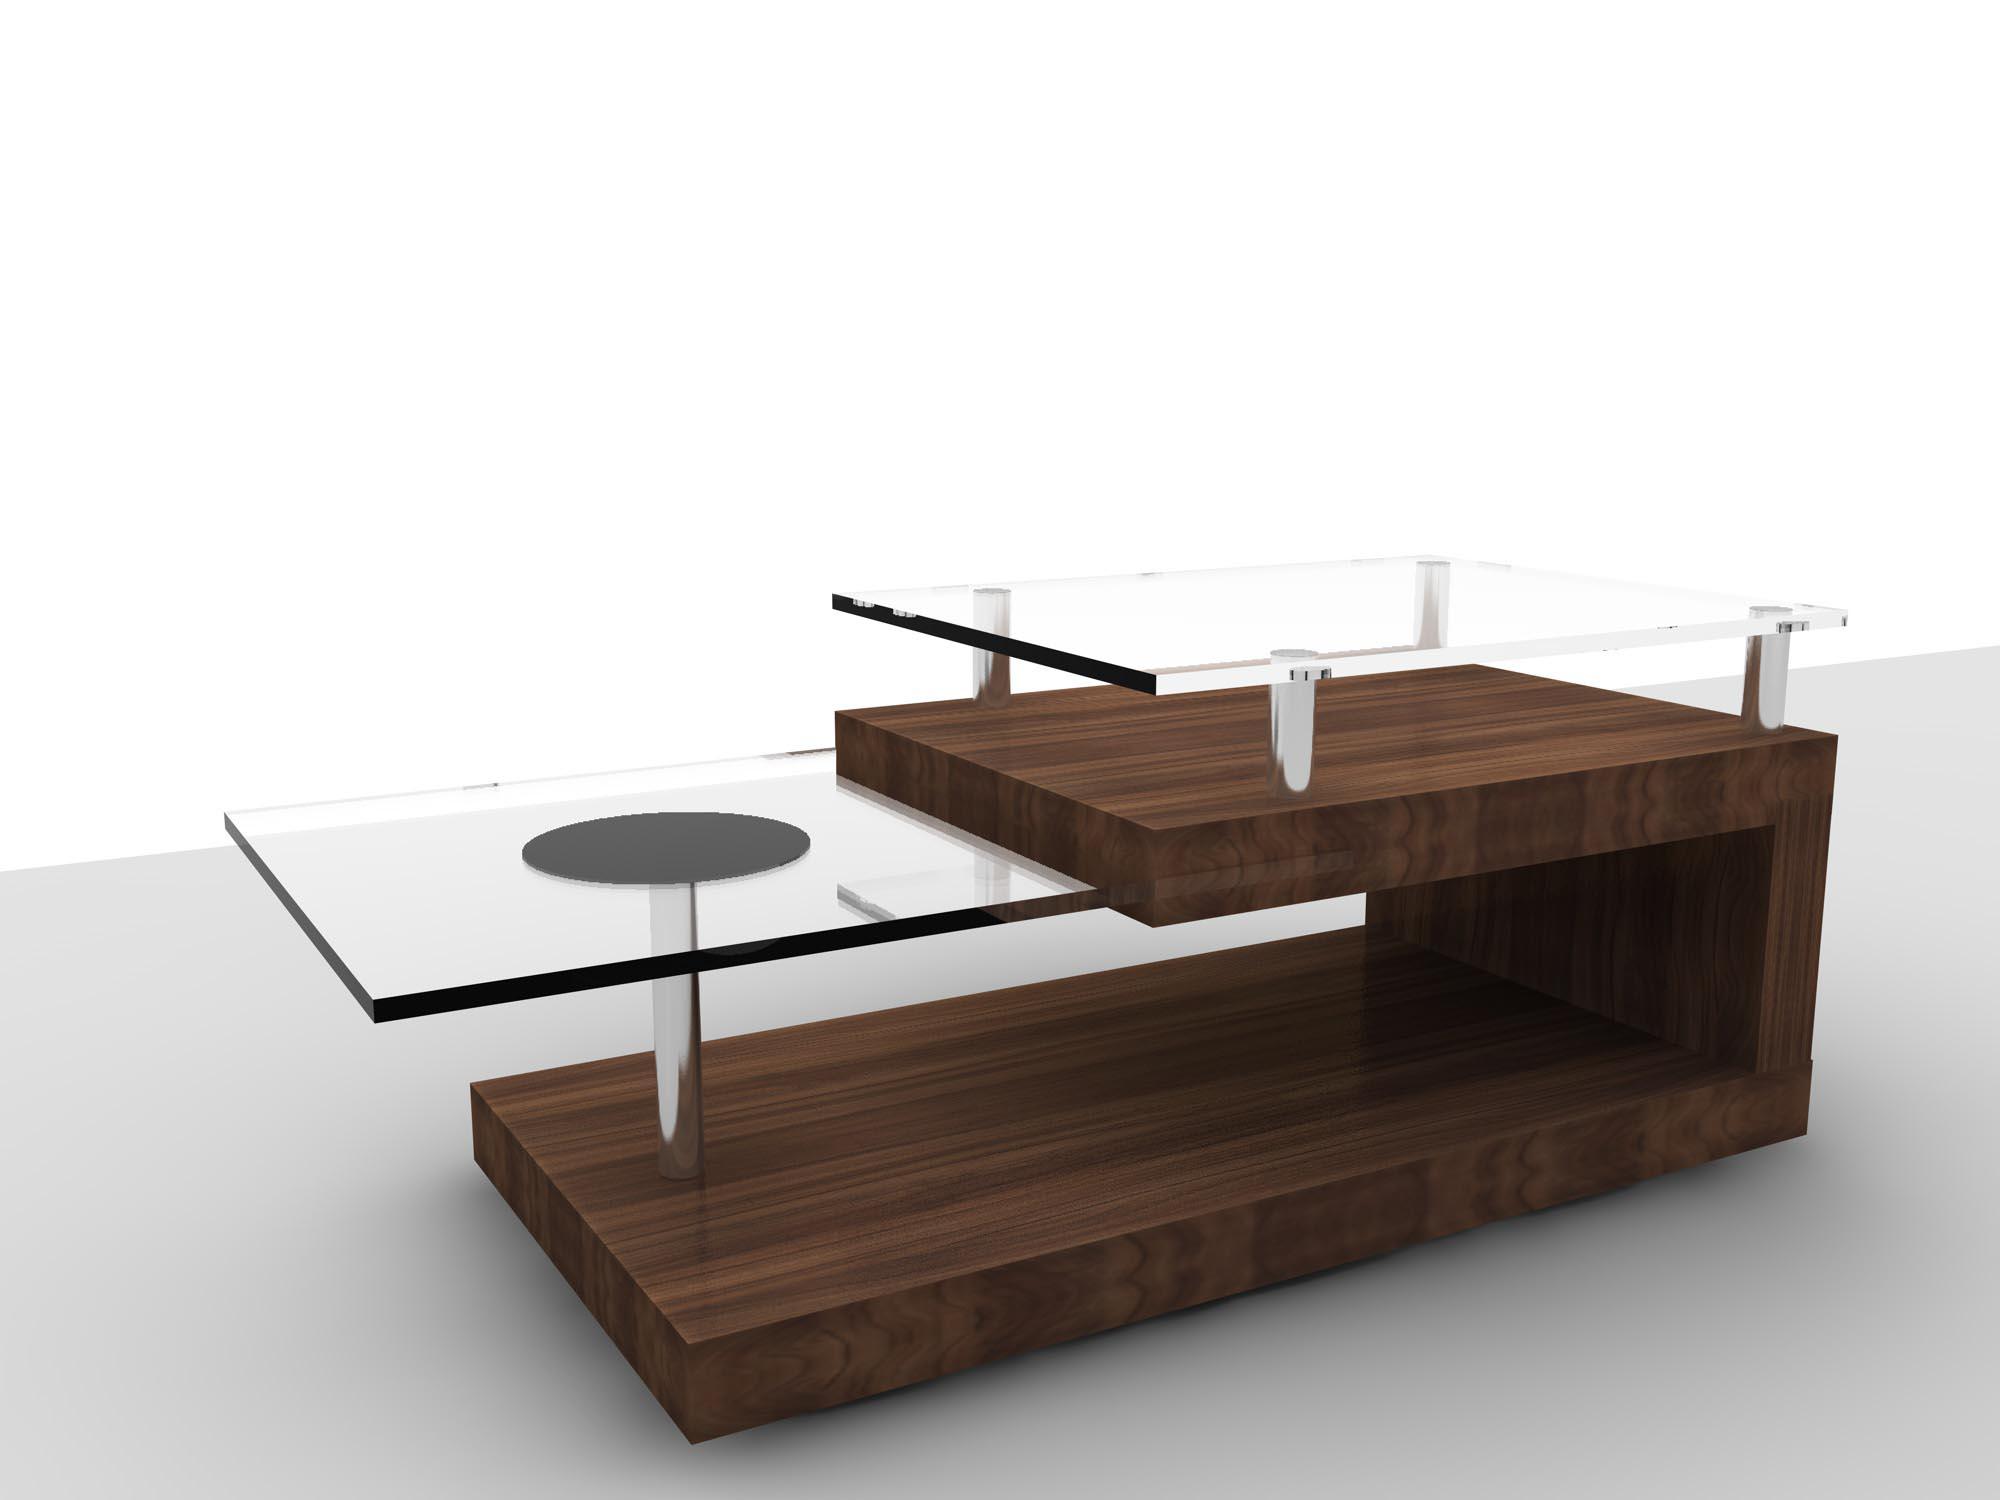 Retro Modern Coffee Table